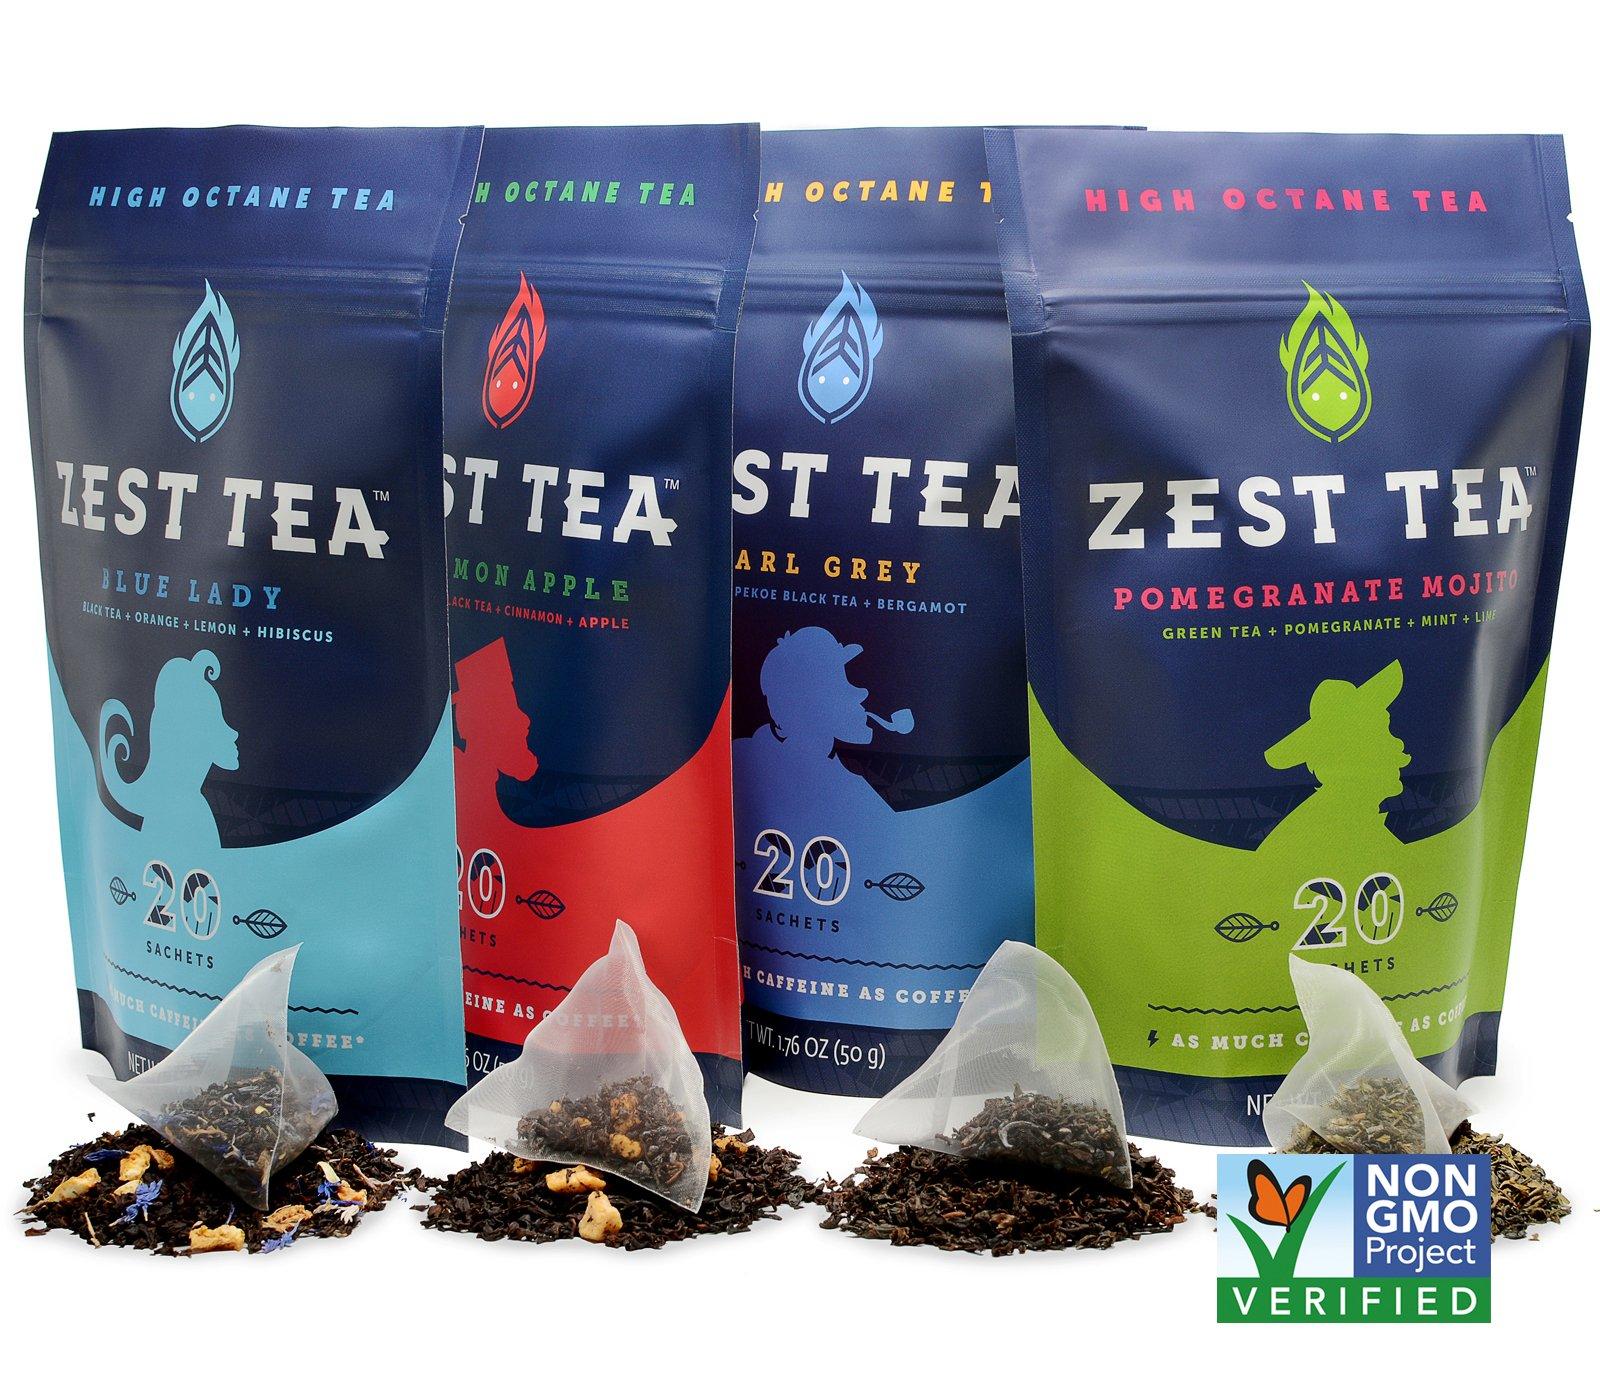 Zest Energy Tea Ultimate Sampler (4-Pack): Premium High Caffeine Blends - Blue Lady (Citrus and Hibiscus), Pomegranate Mojito, Earl Grey, Apple Cinnamon Flavors (200 g) (80 servings) by Zest Tea